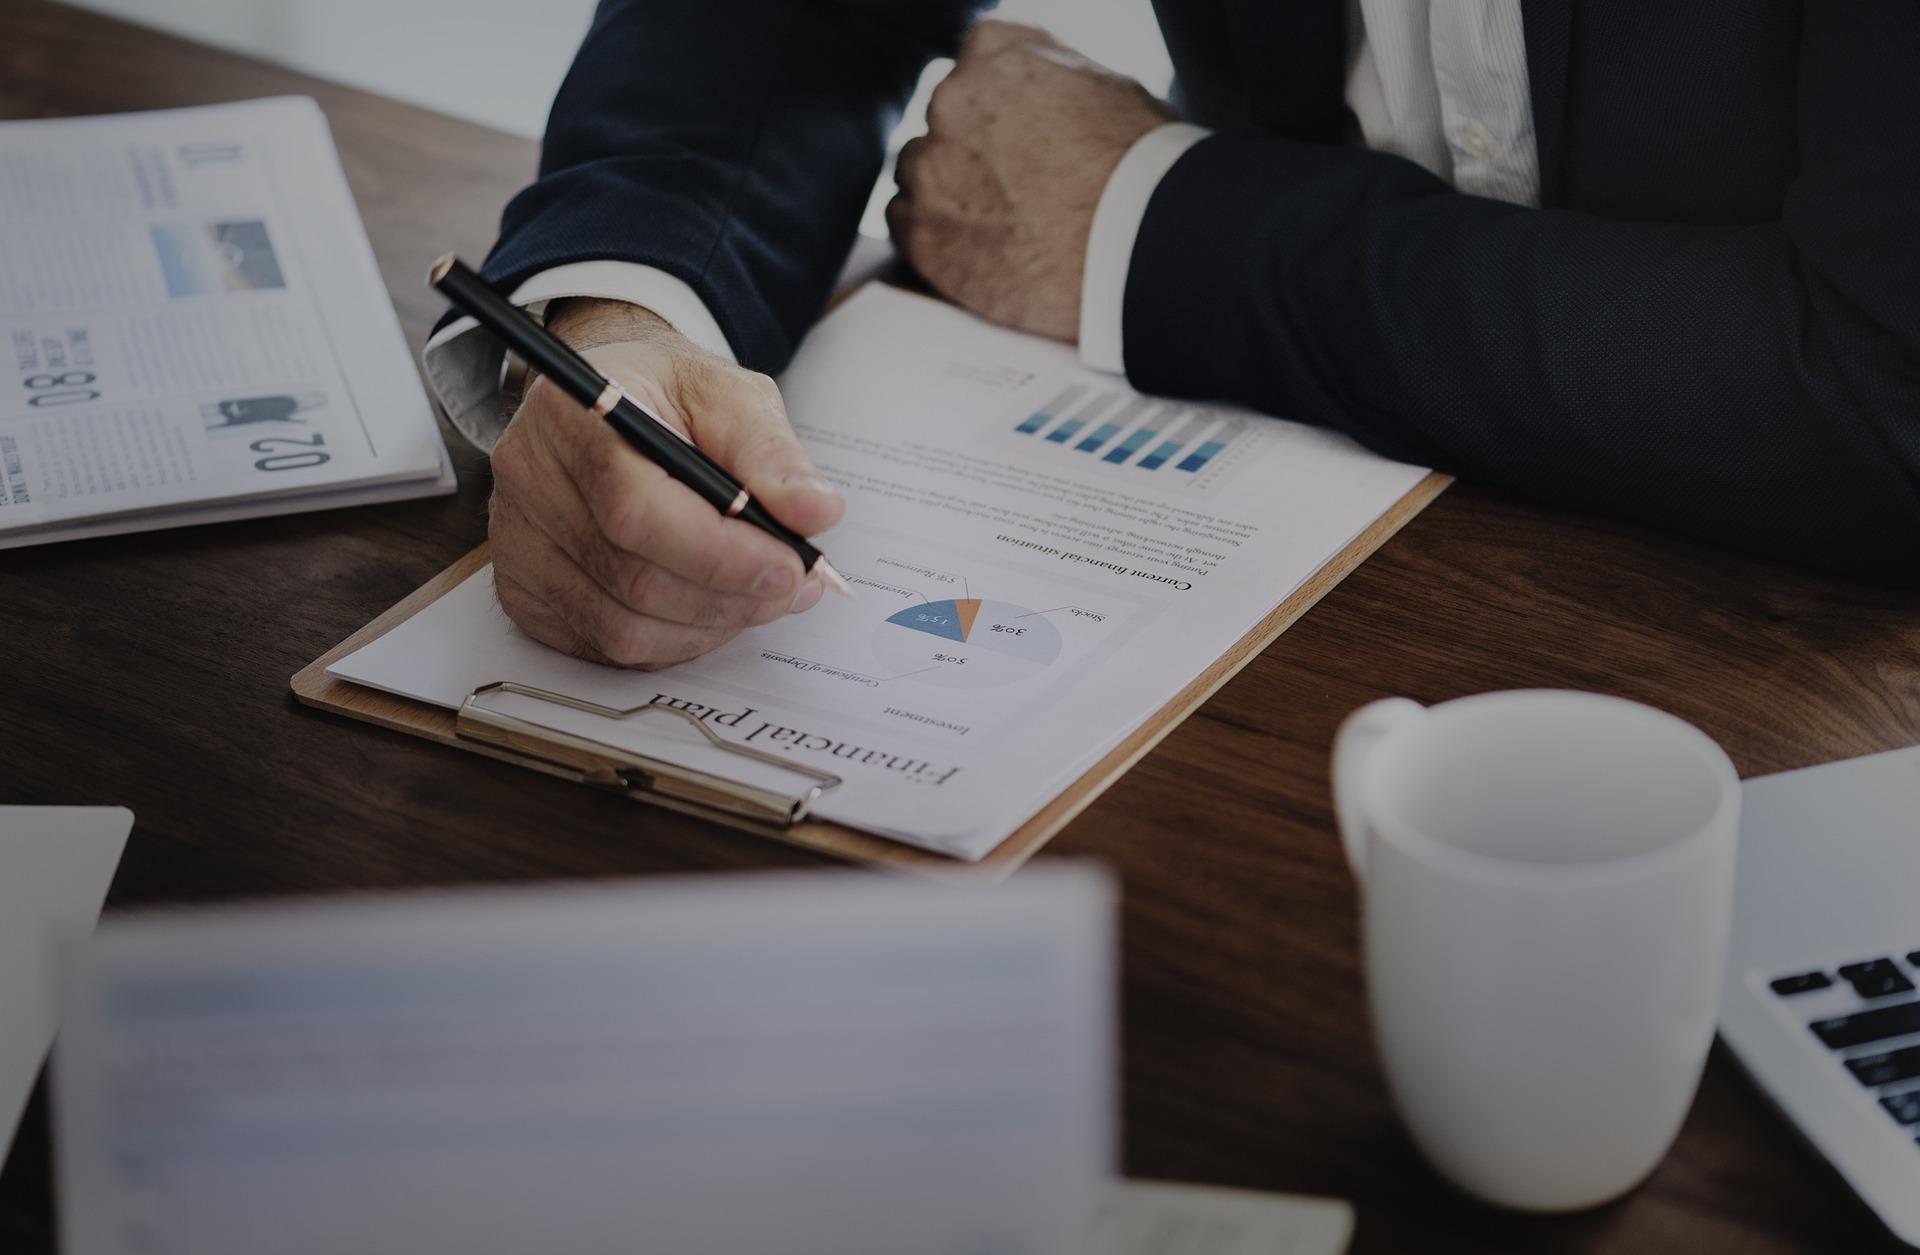 CIO writing on financial charts